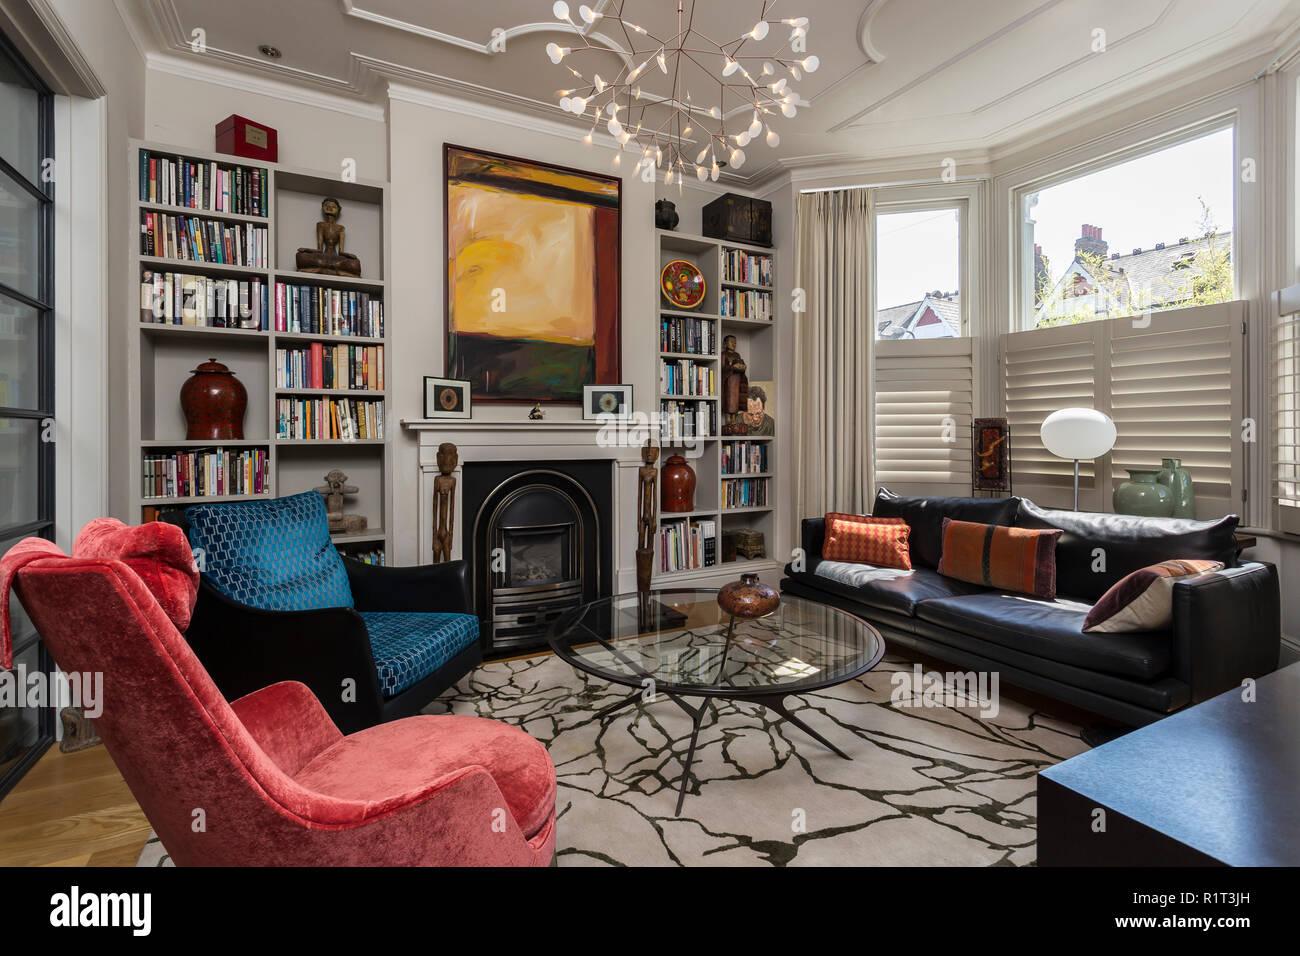 London House - Stock Image